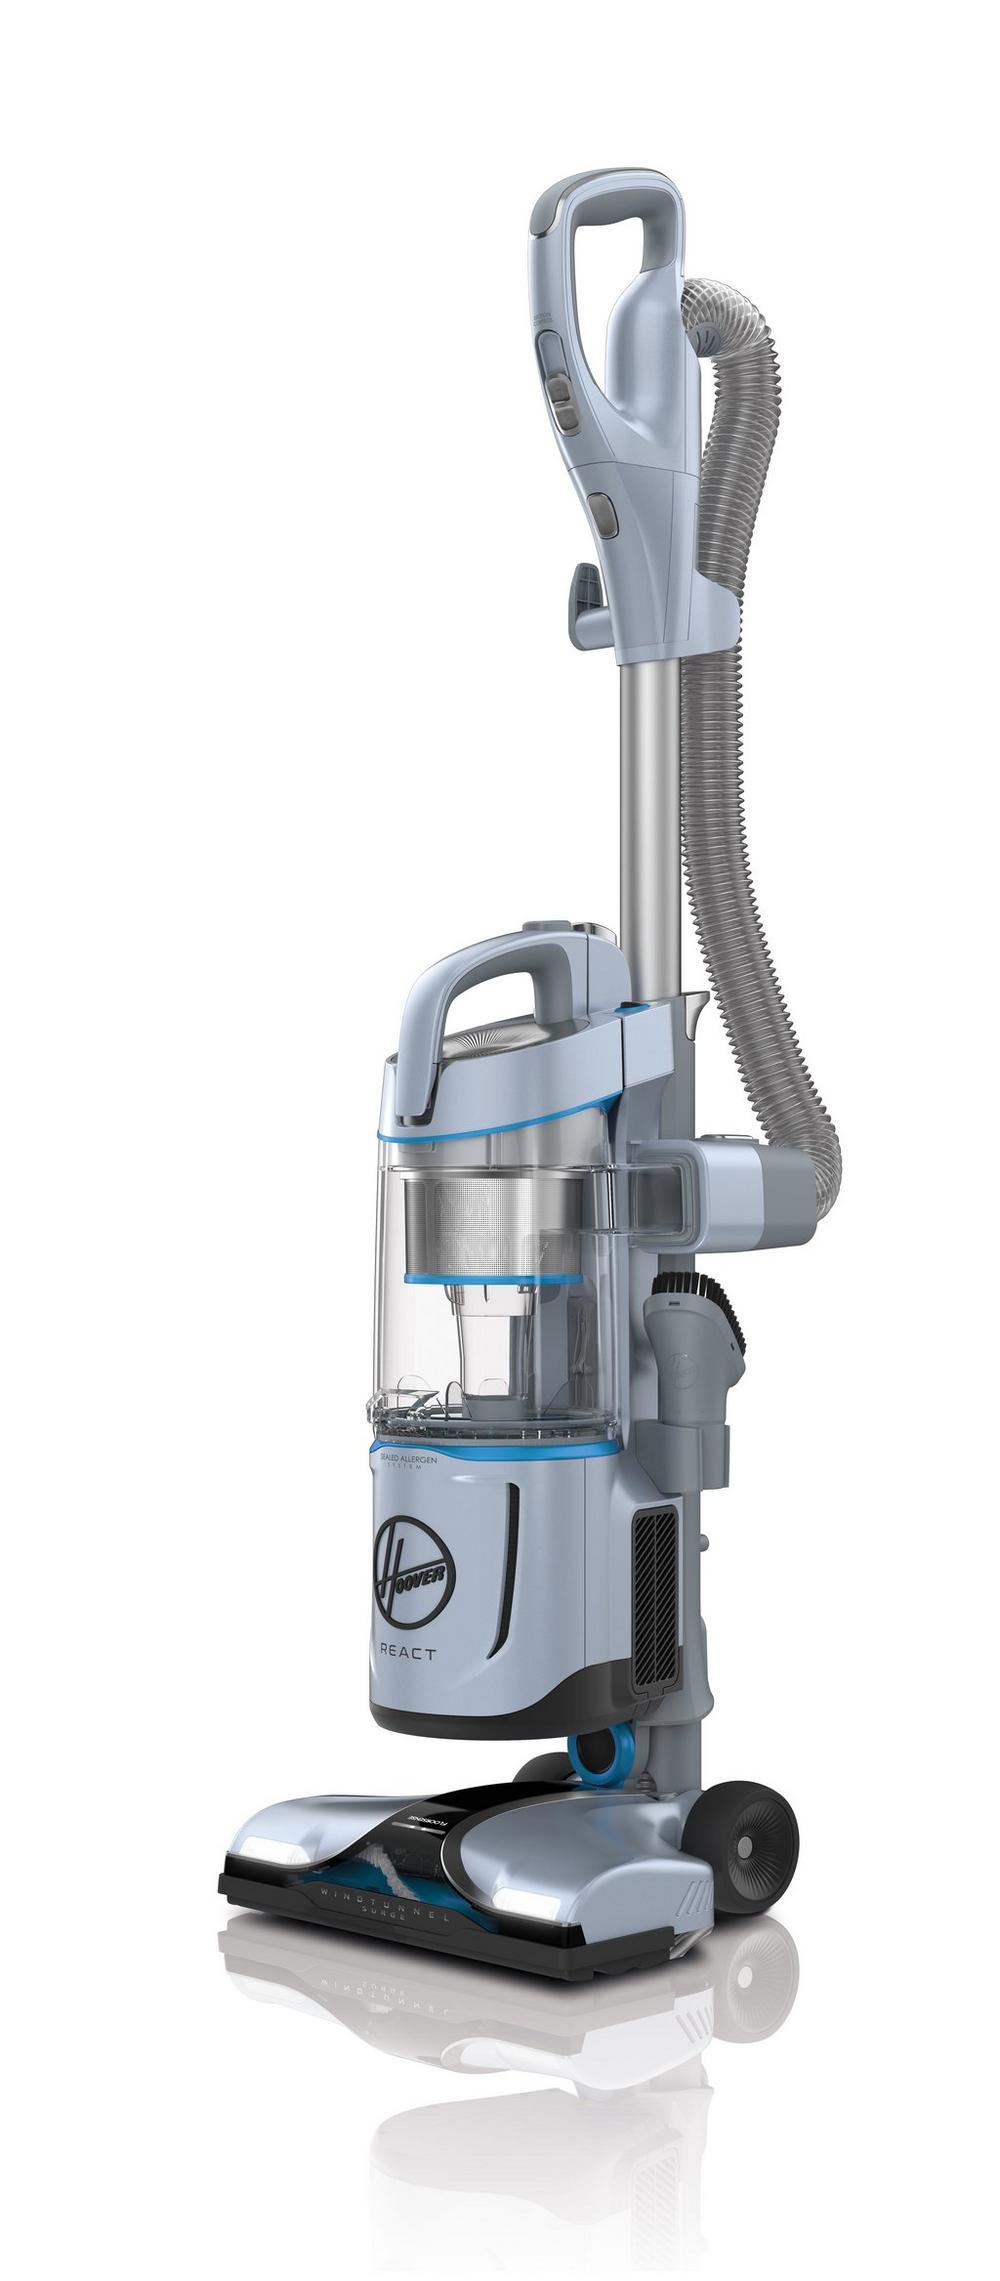 REACT QuickLift Deluxe Upright Vacuum15